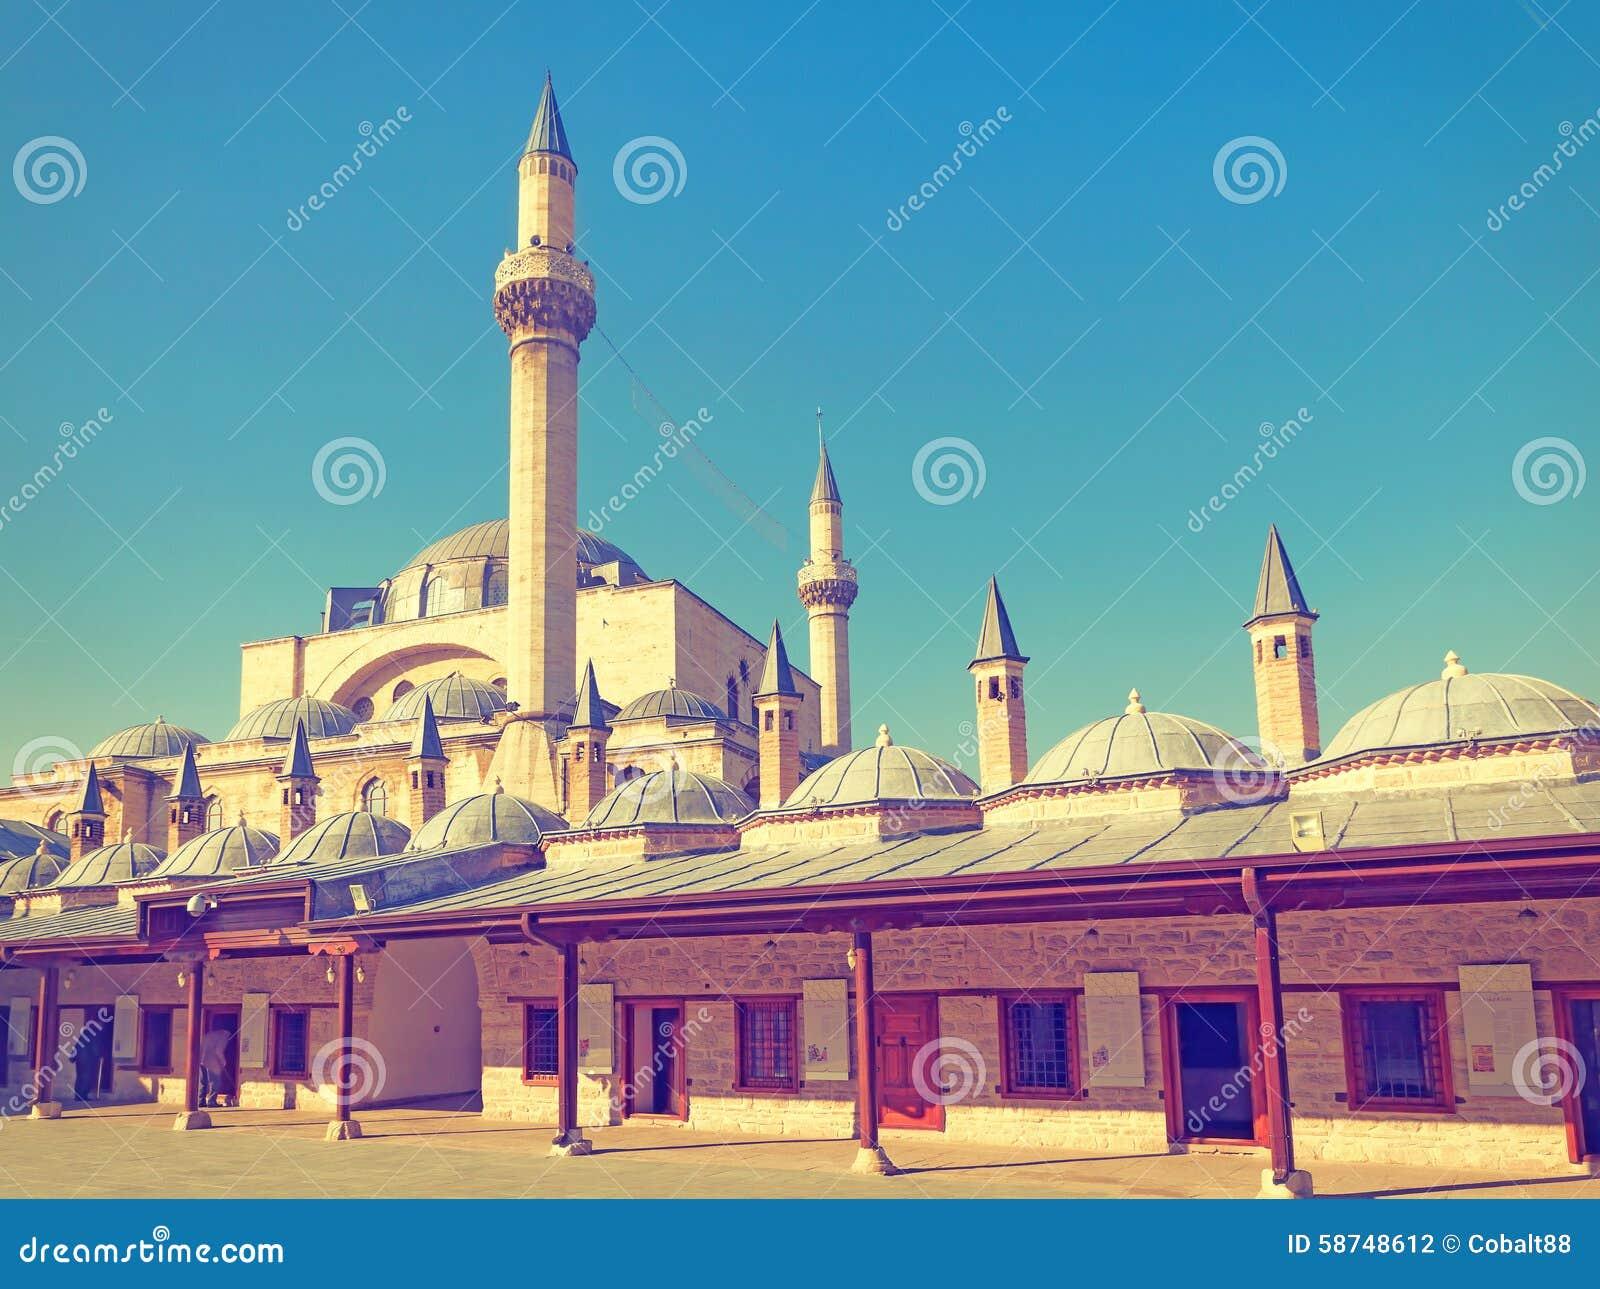 Mevlana Museum Mosque Stock Photo - Image: 58748612